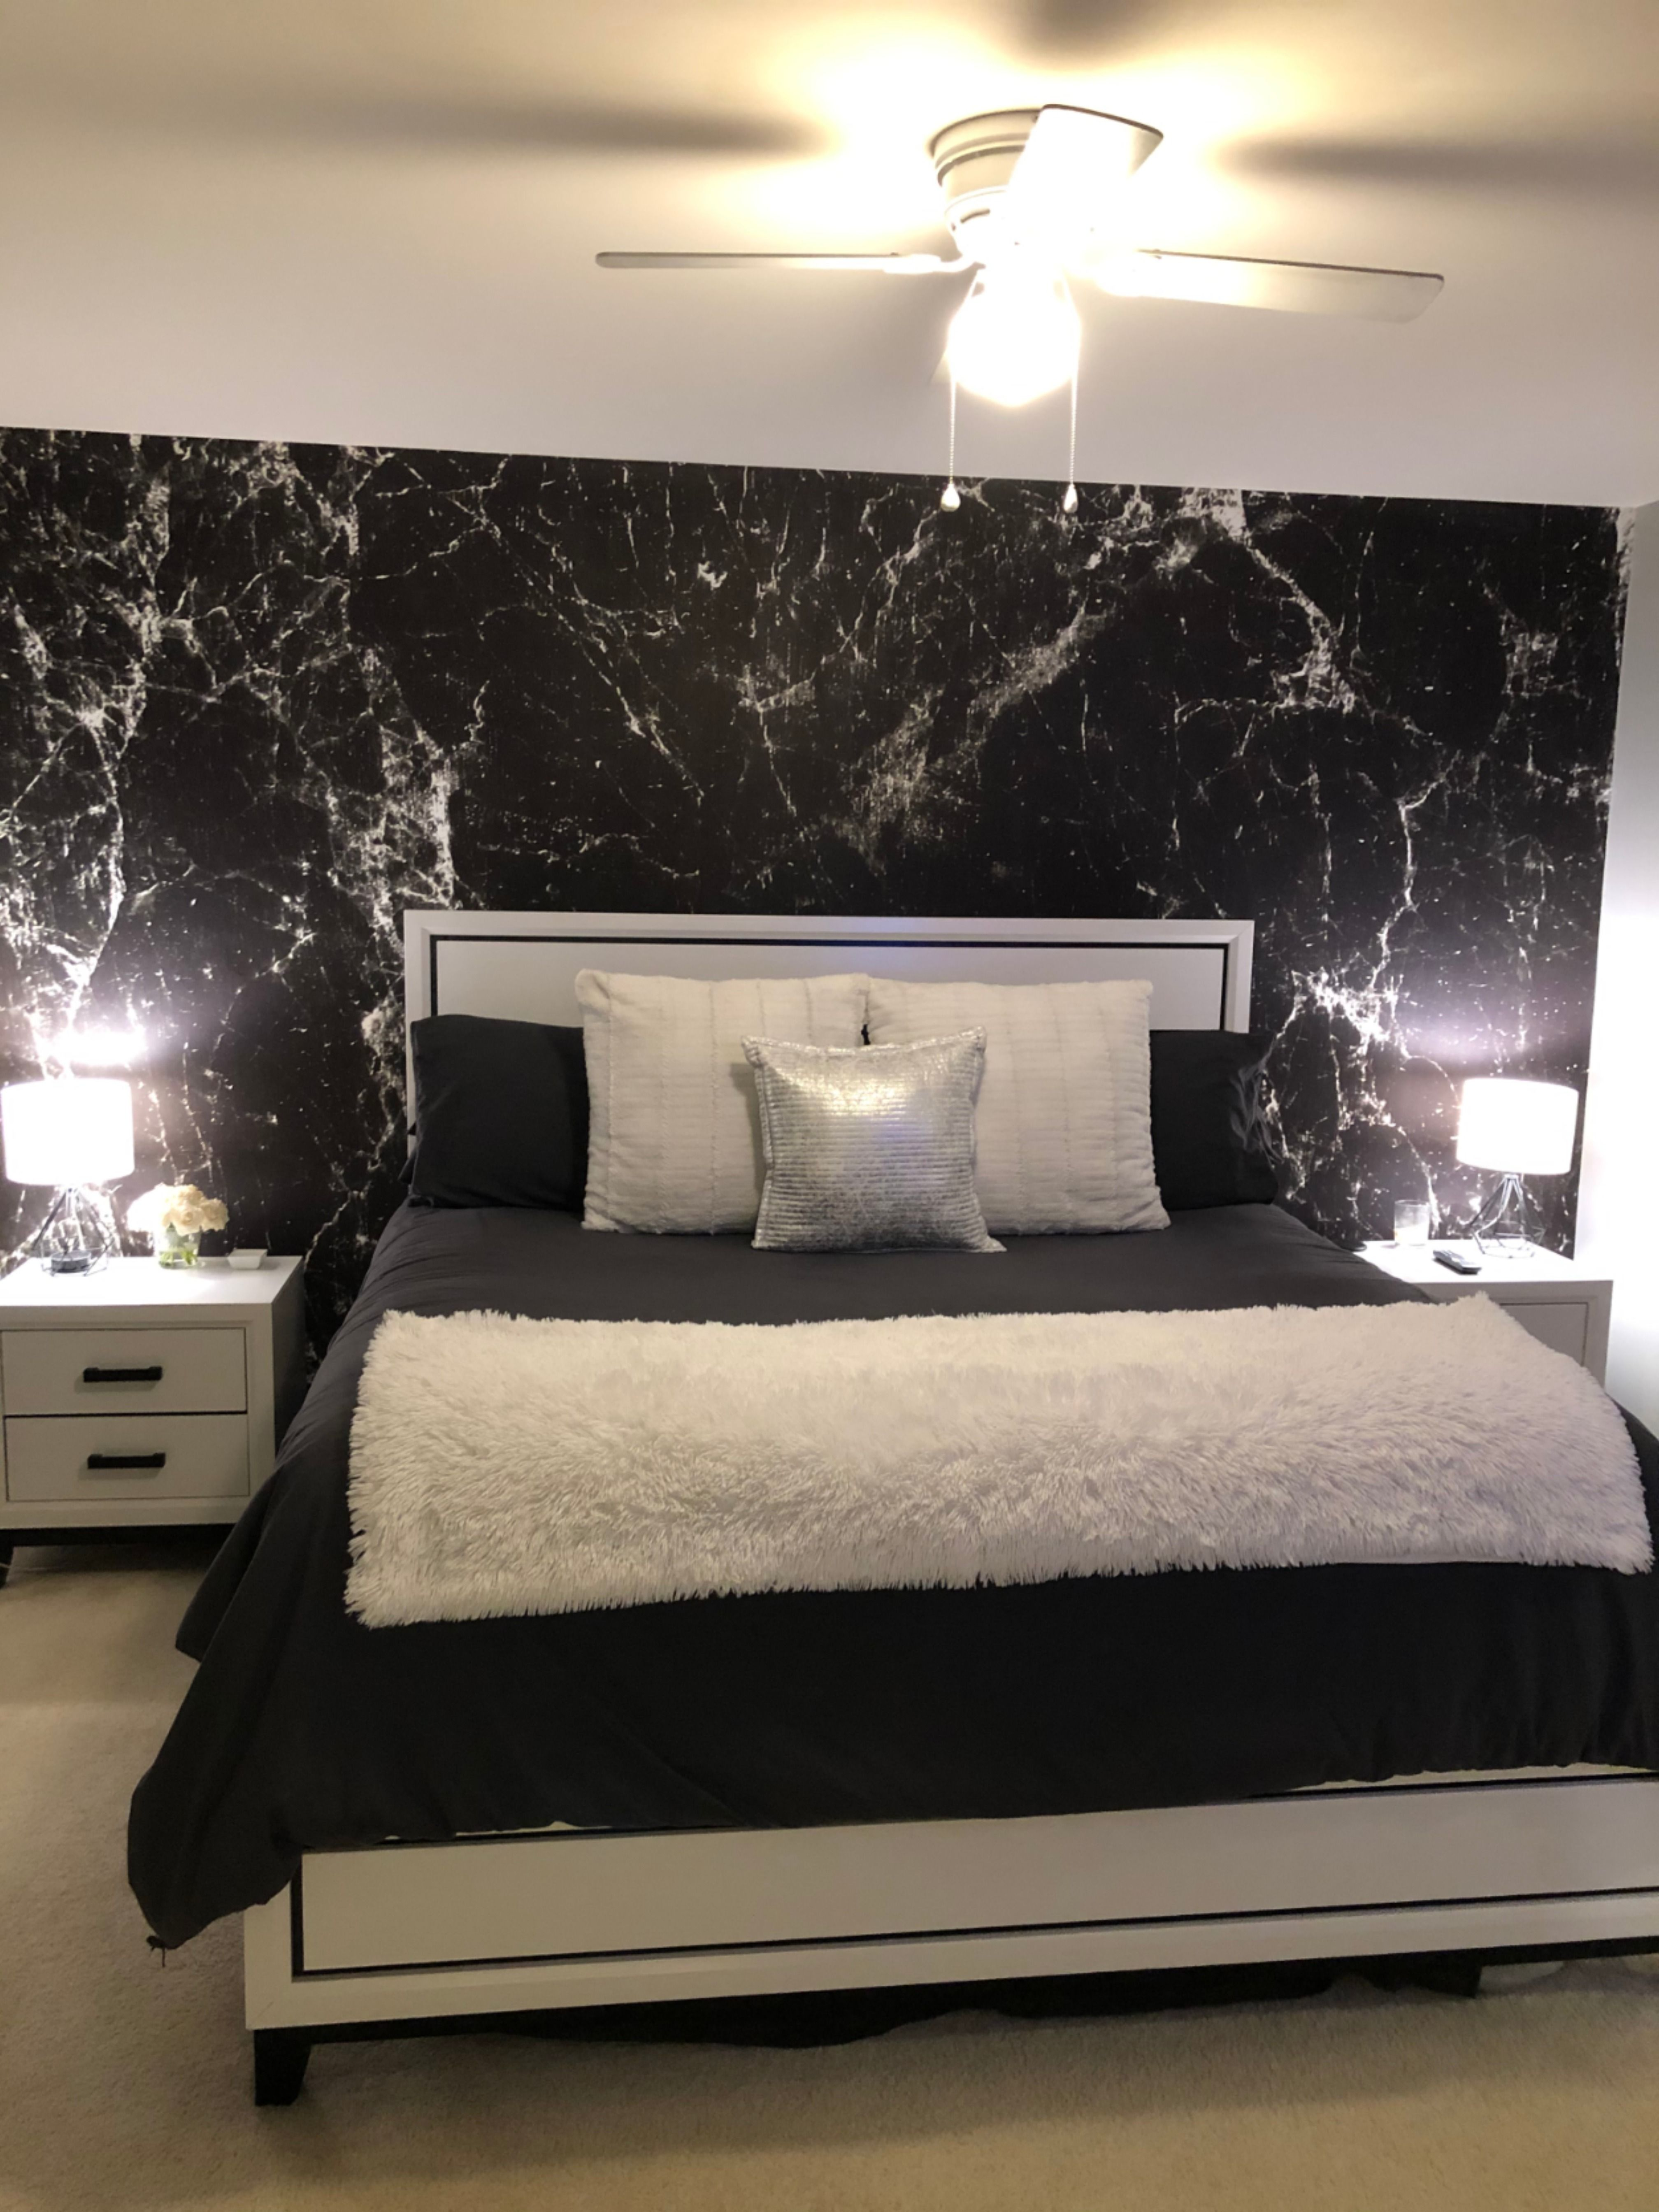 Marble Wallpaper Bedroom Wall Decor Bedroom Wallpaper Mural Black Wallpaper Bedroom Marble Wallpaper Bedroom Bedroom Makeover